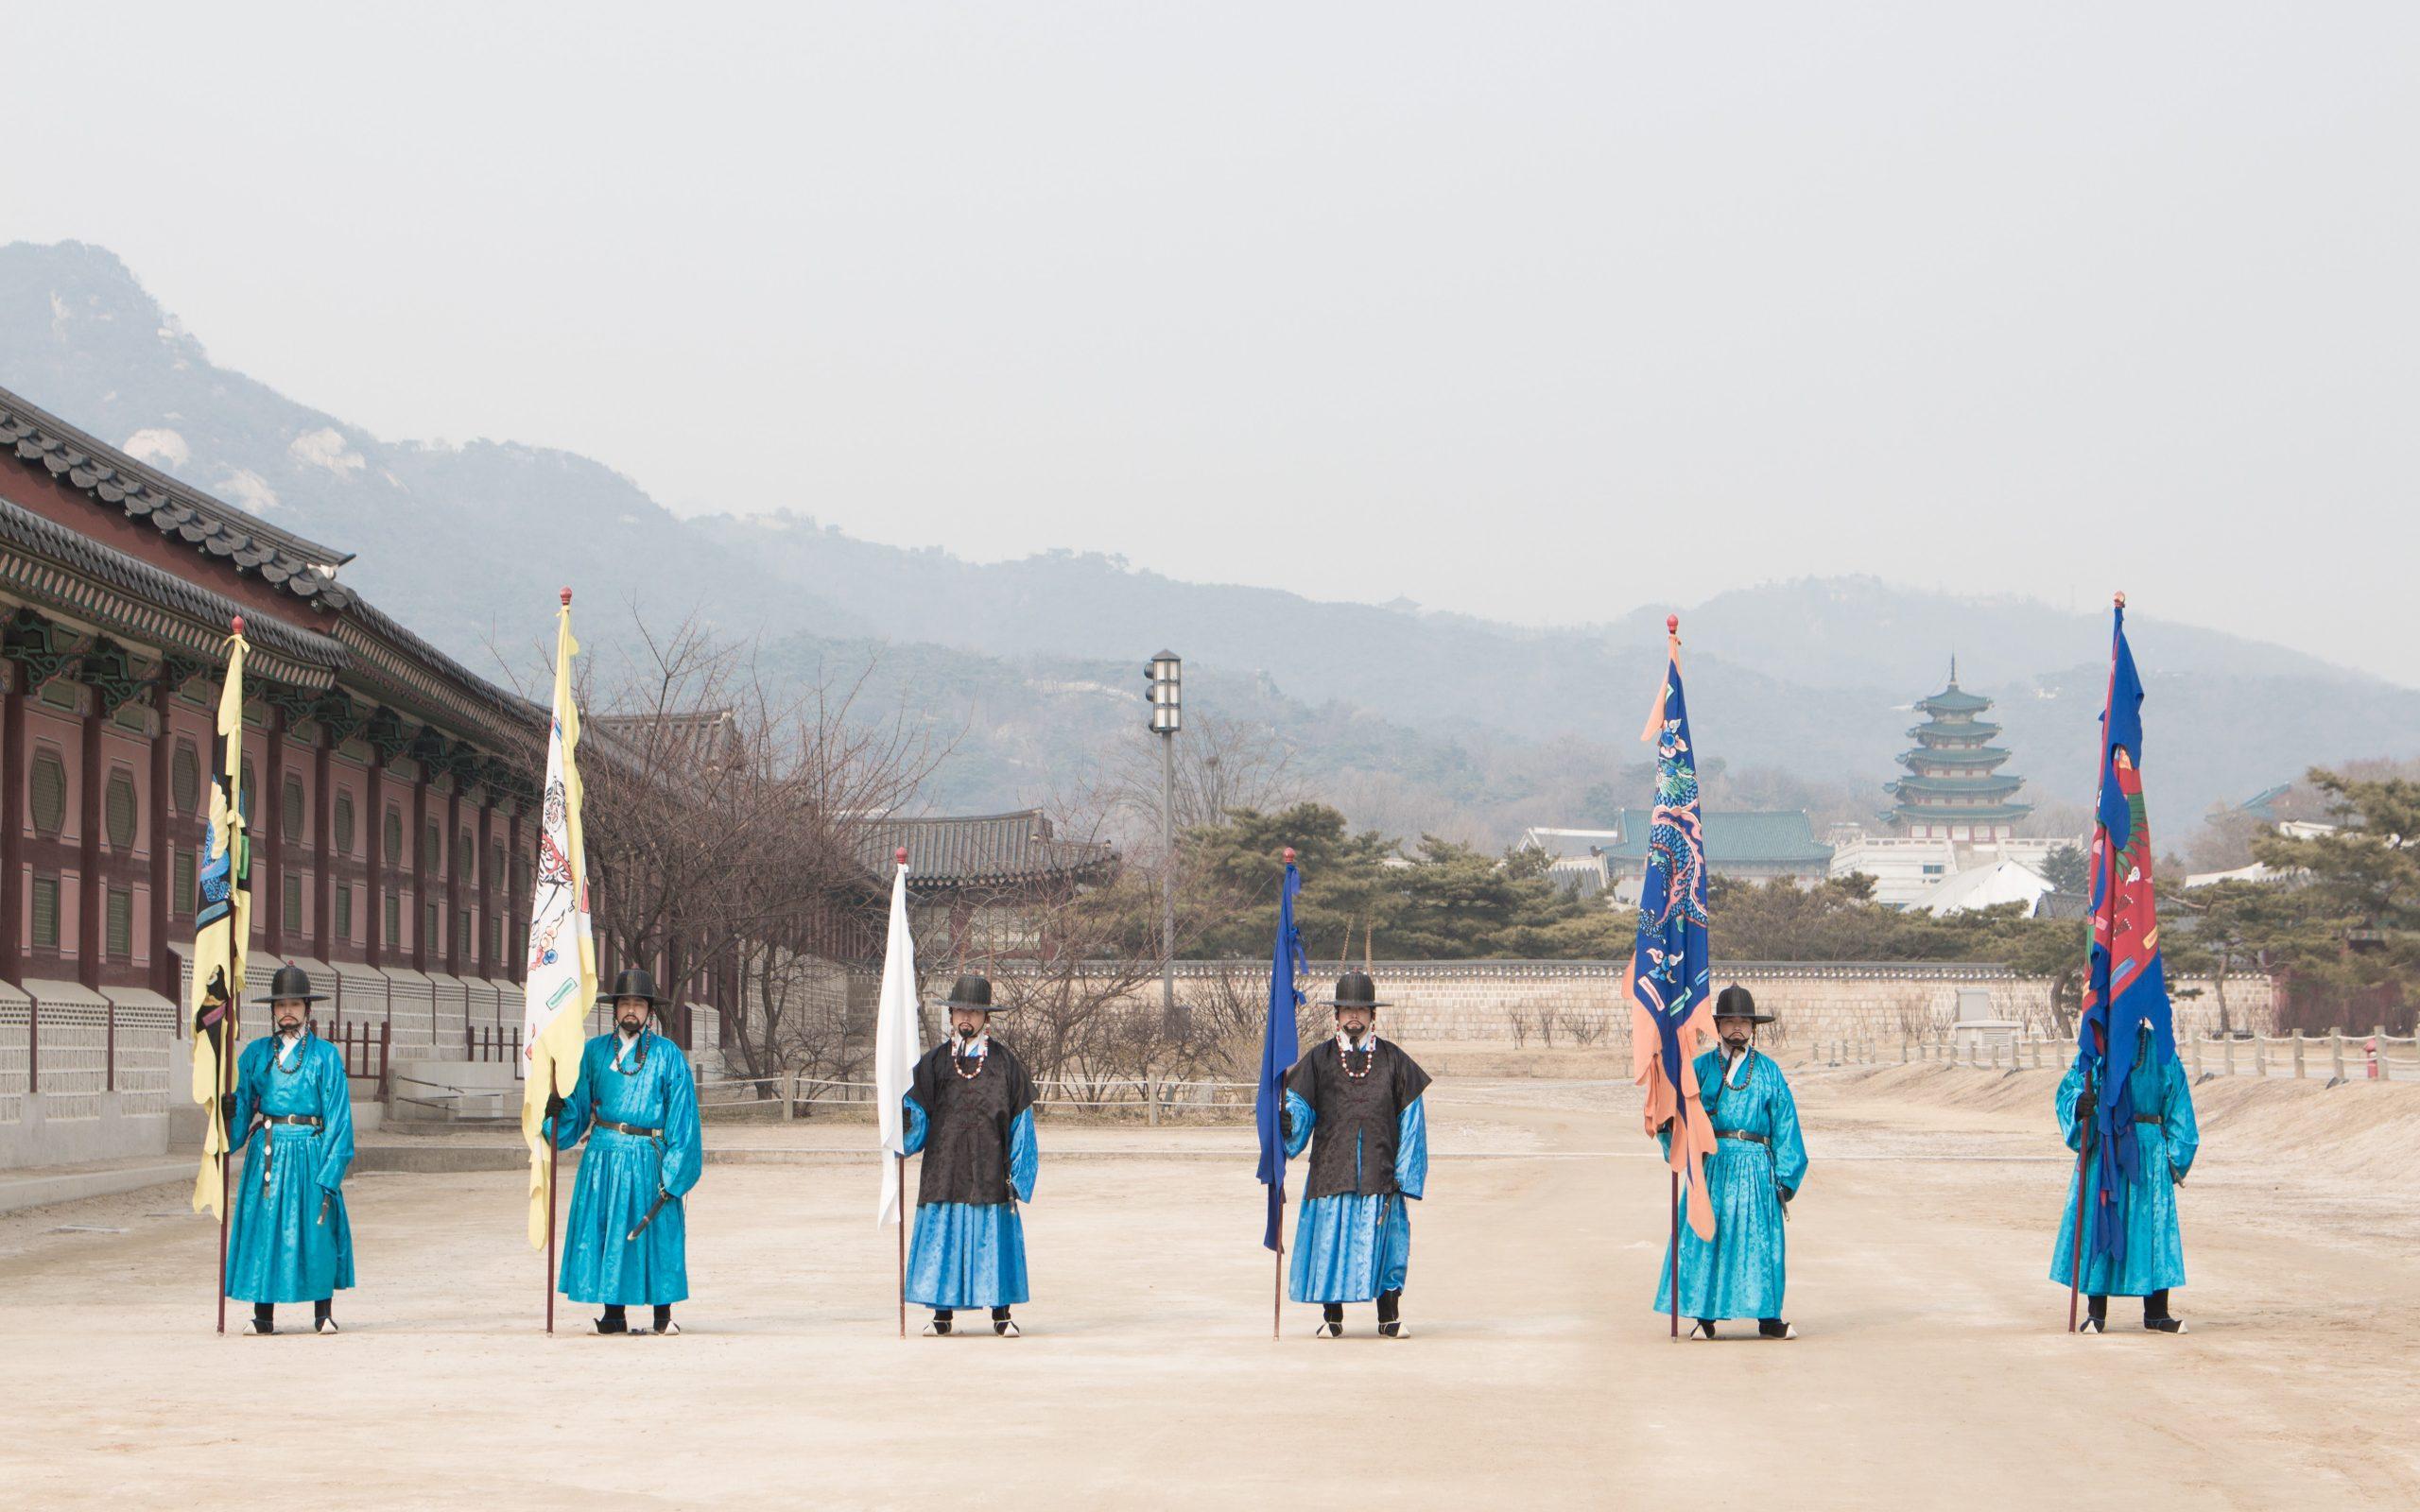 Korean courtyard